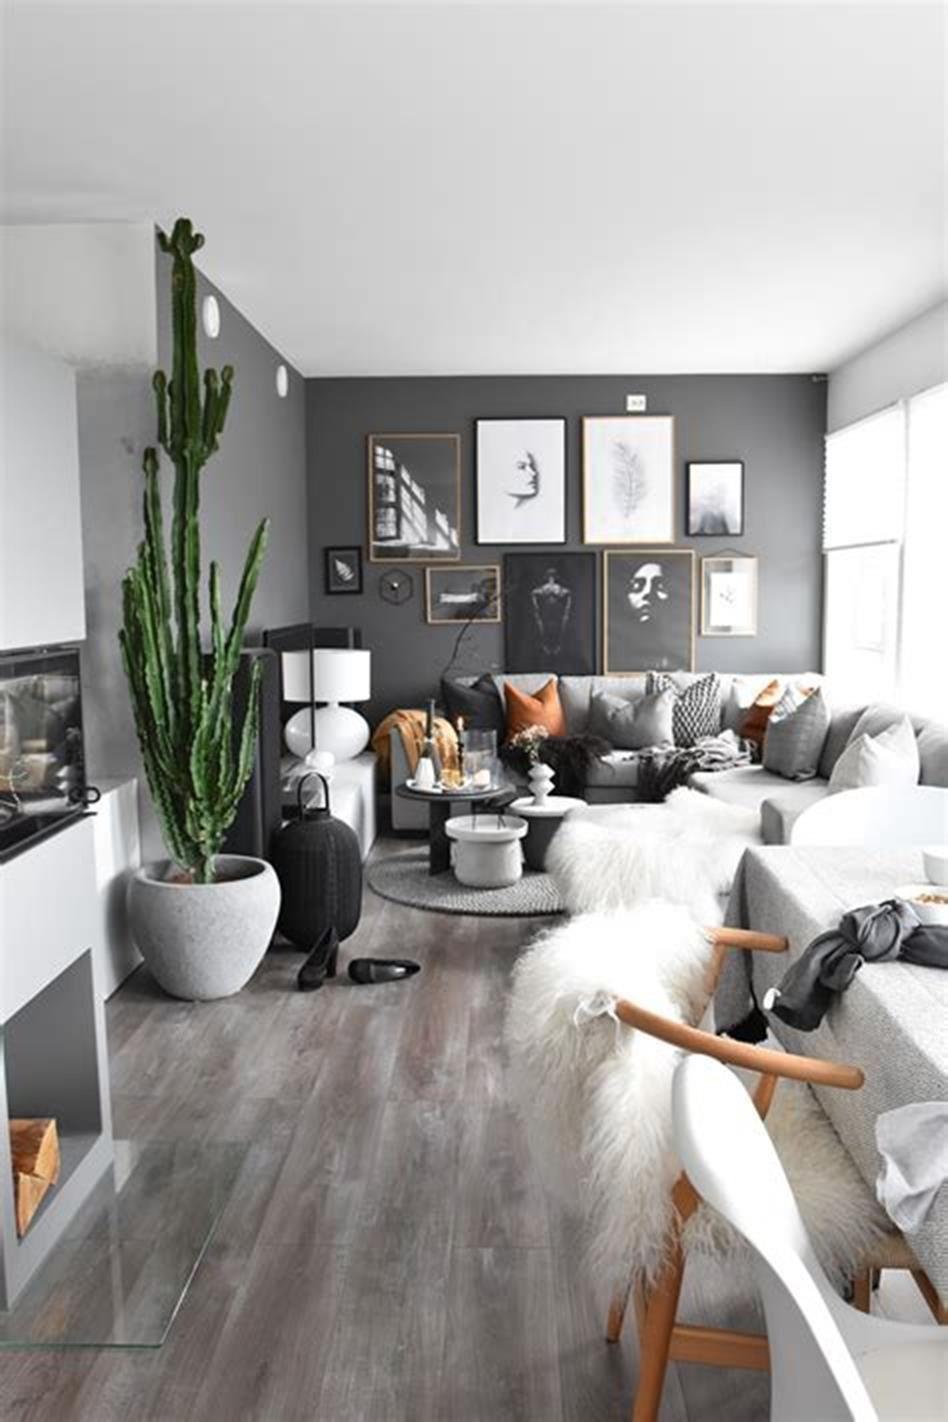 Living Room Interior Design 2019 2020 Design Interior Living Room In 2020 Grey Sofa Living Room Living Room Grey Living Room Decor Gray